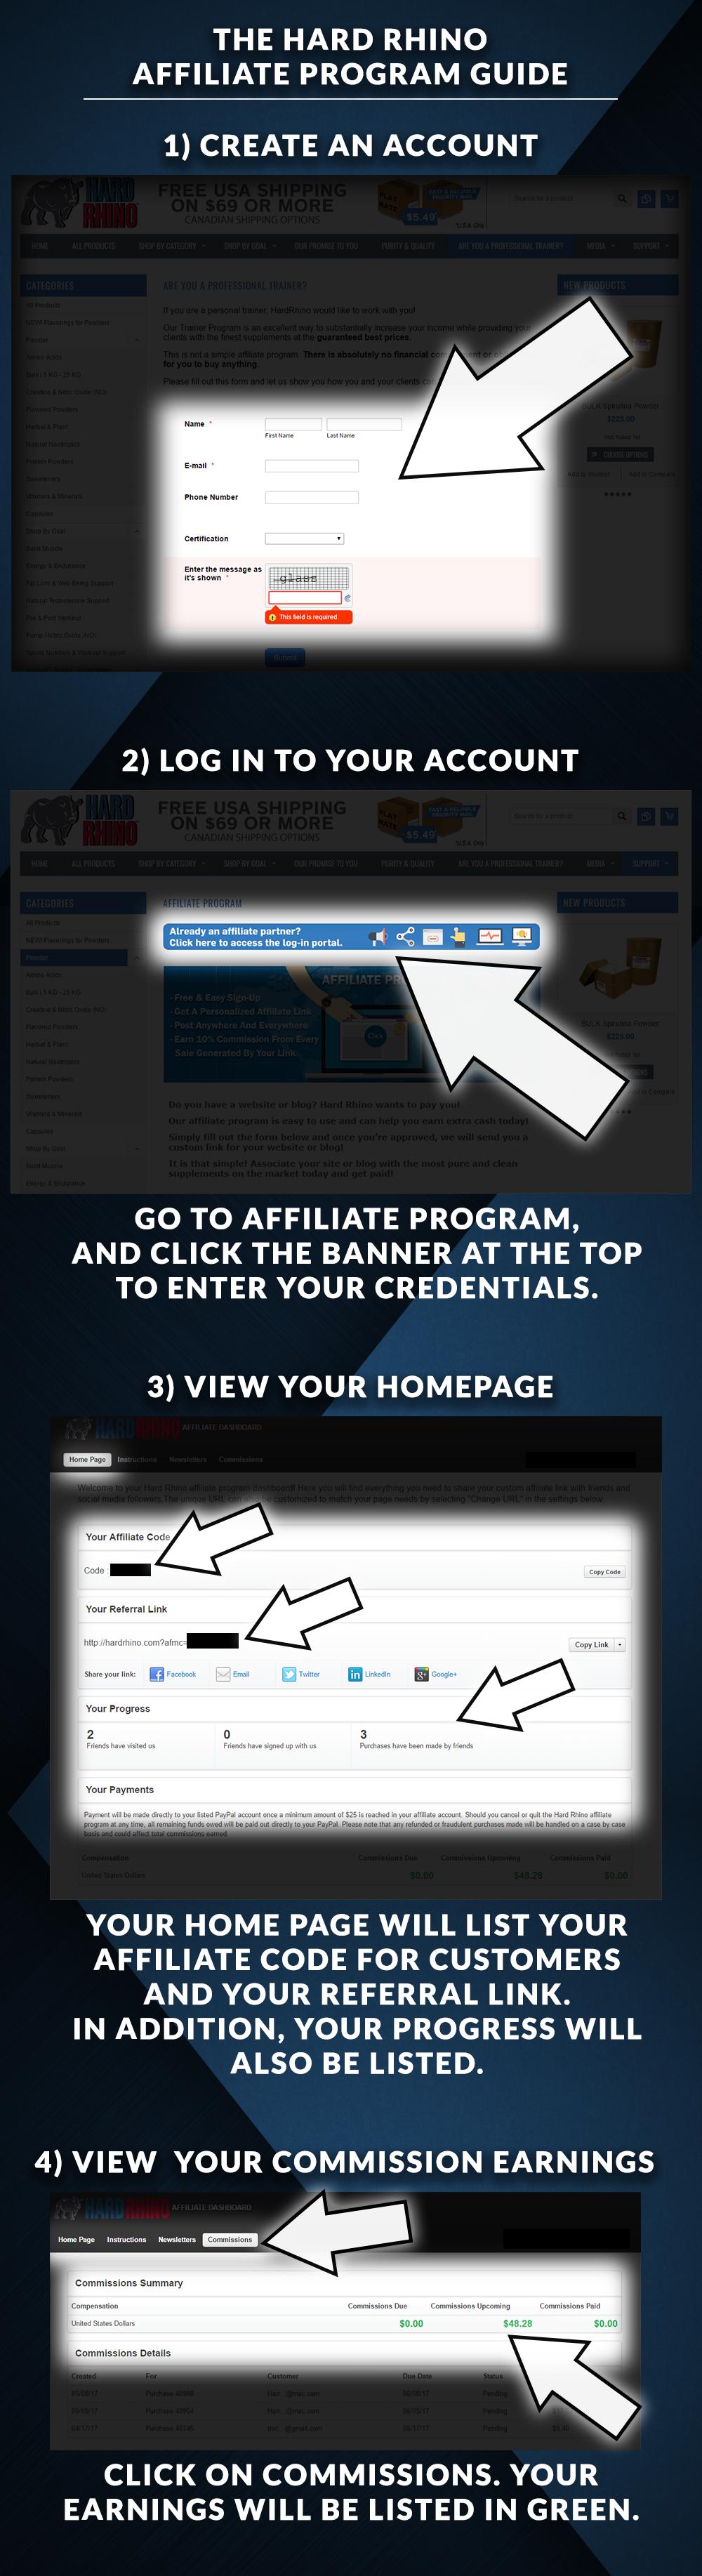 affiliate-program-instructions.png